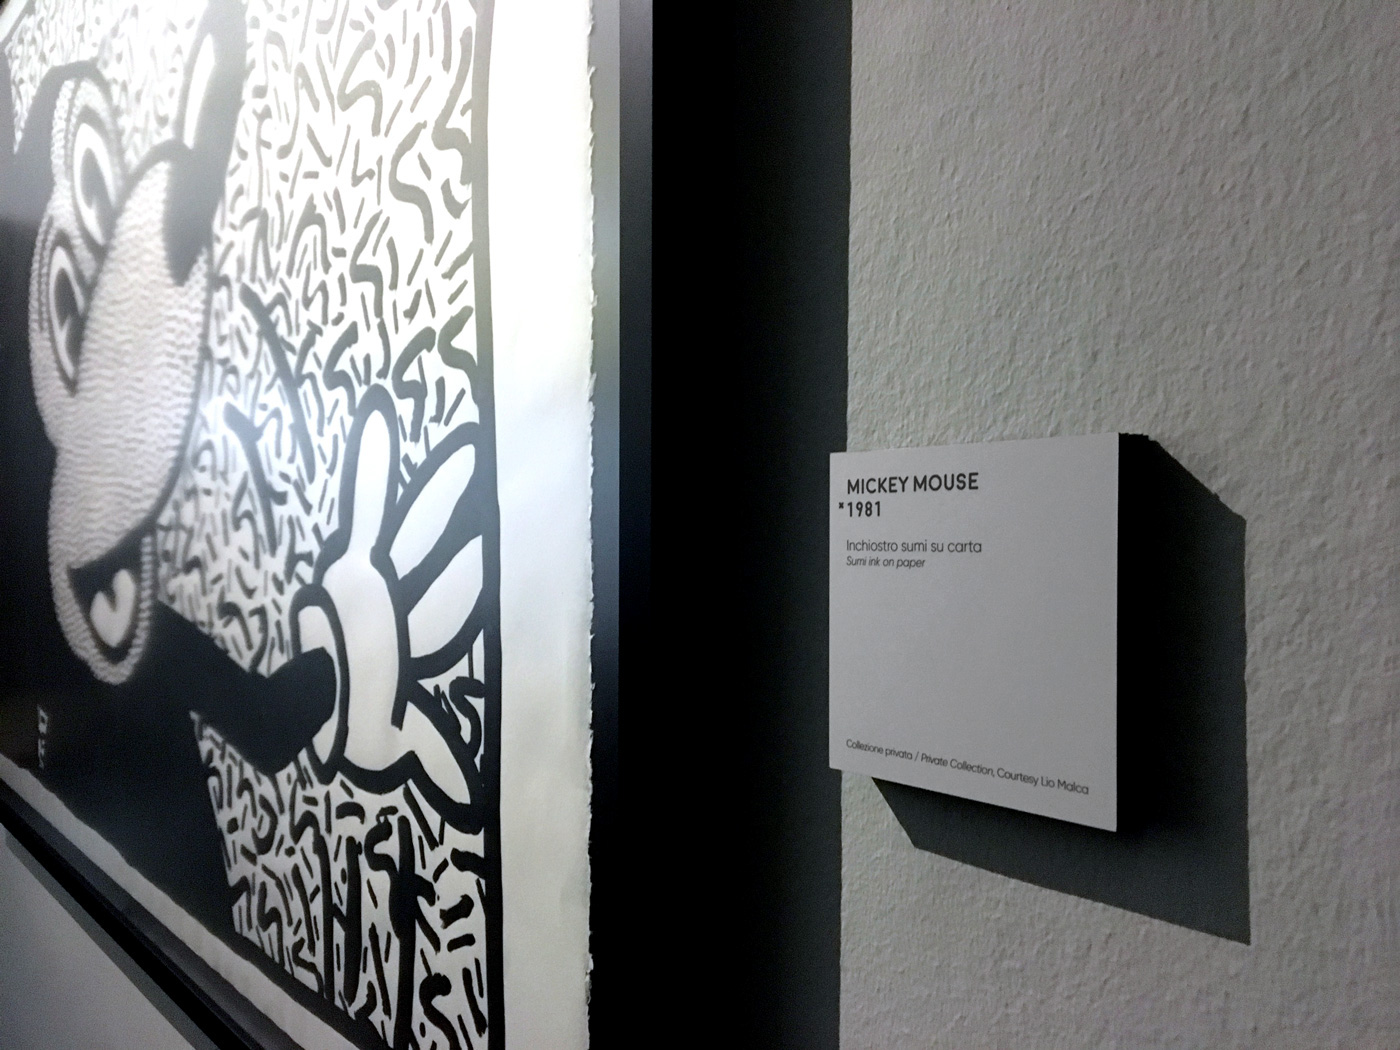 mostra ketih haring exhibit Palazzo Reale milano art exposition museum graphic graphic design